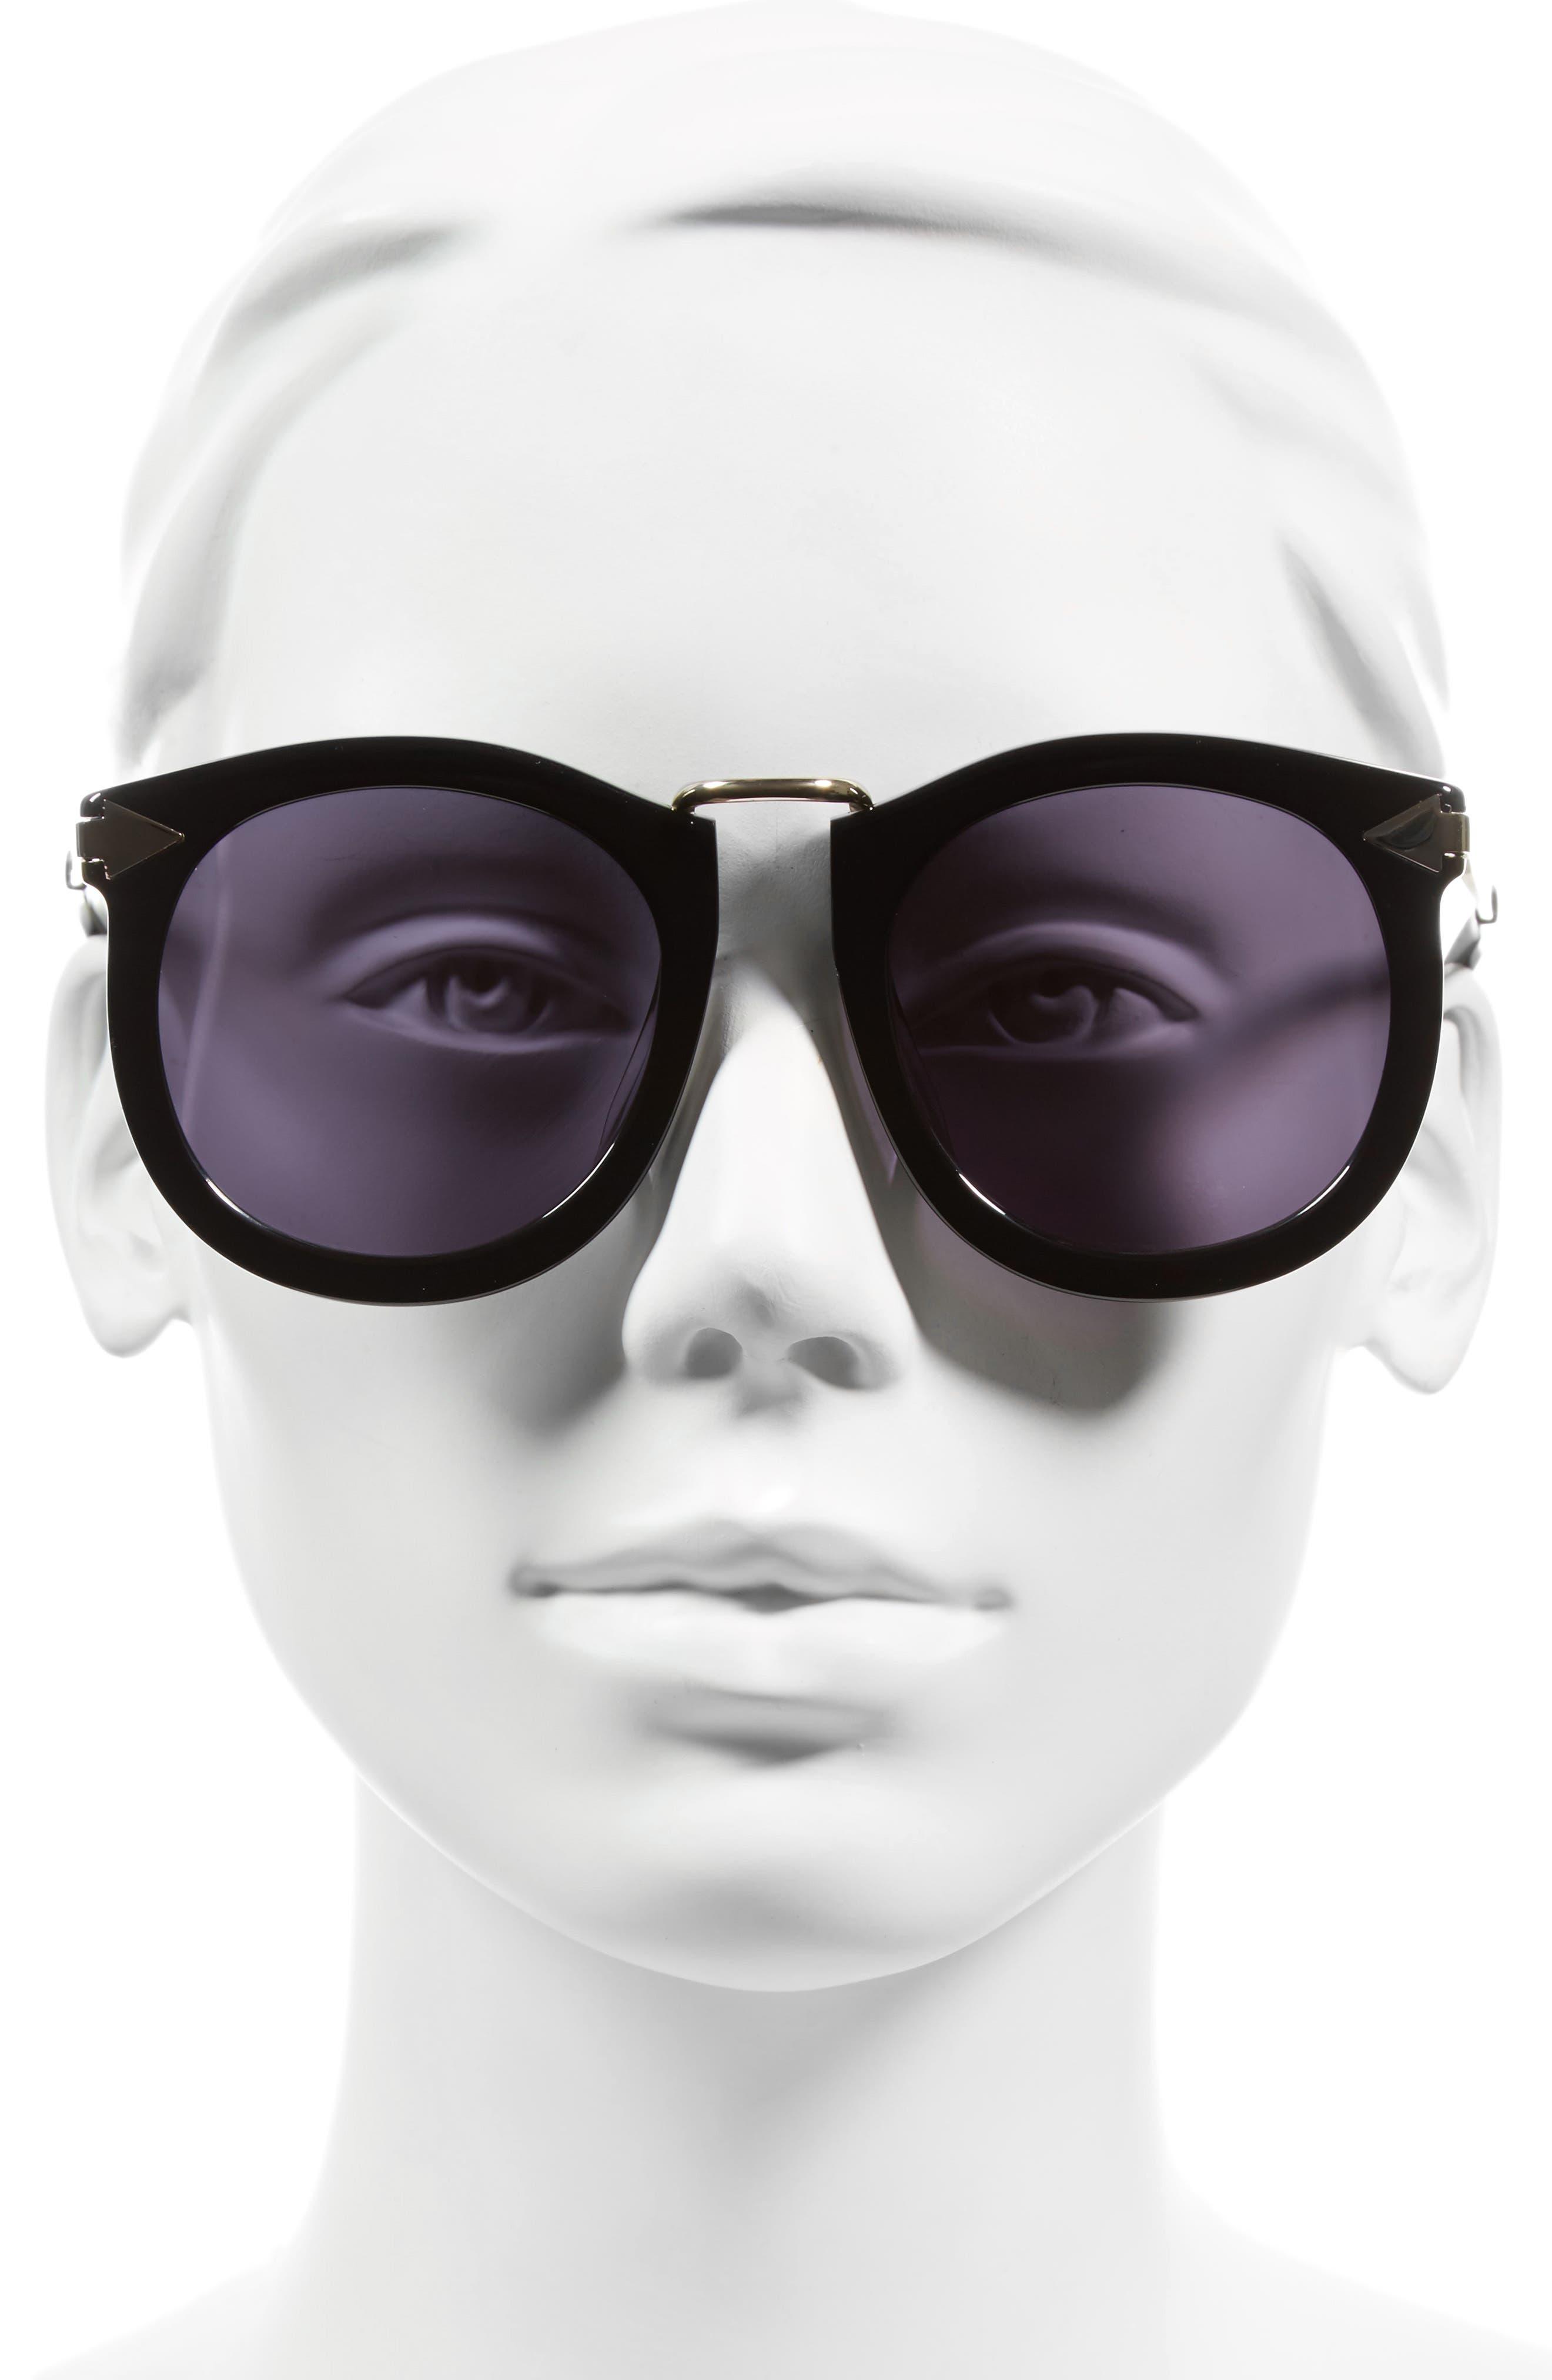 Alternative Fit Super Lunar - Arrowed by Karen 50mm Sunglasses,                             Alternate thumbnail 5, color,